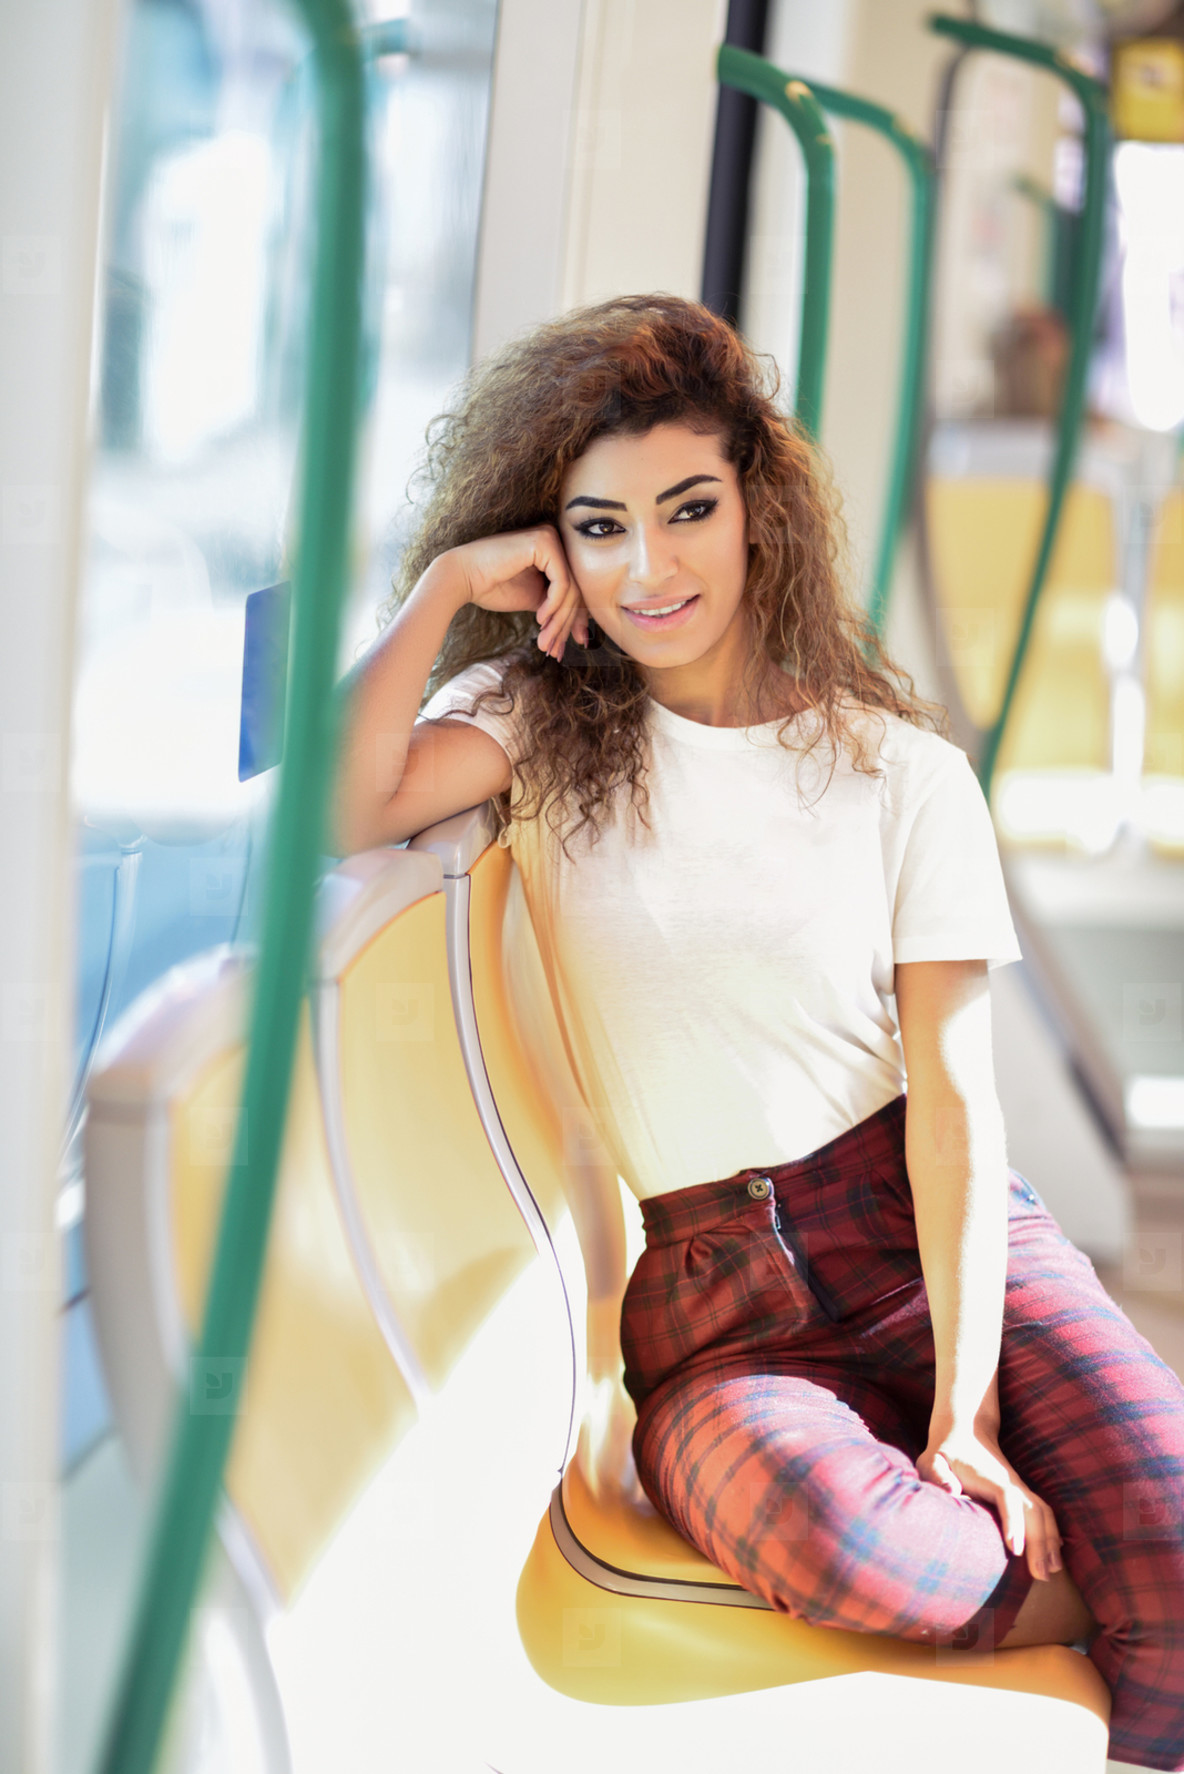 Arab woman inside metro train  Arab girl in casual clothes